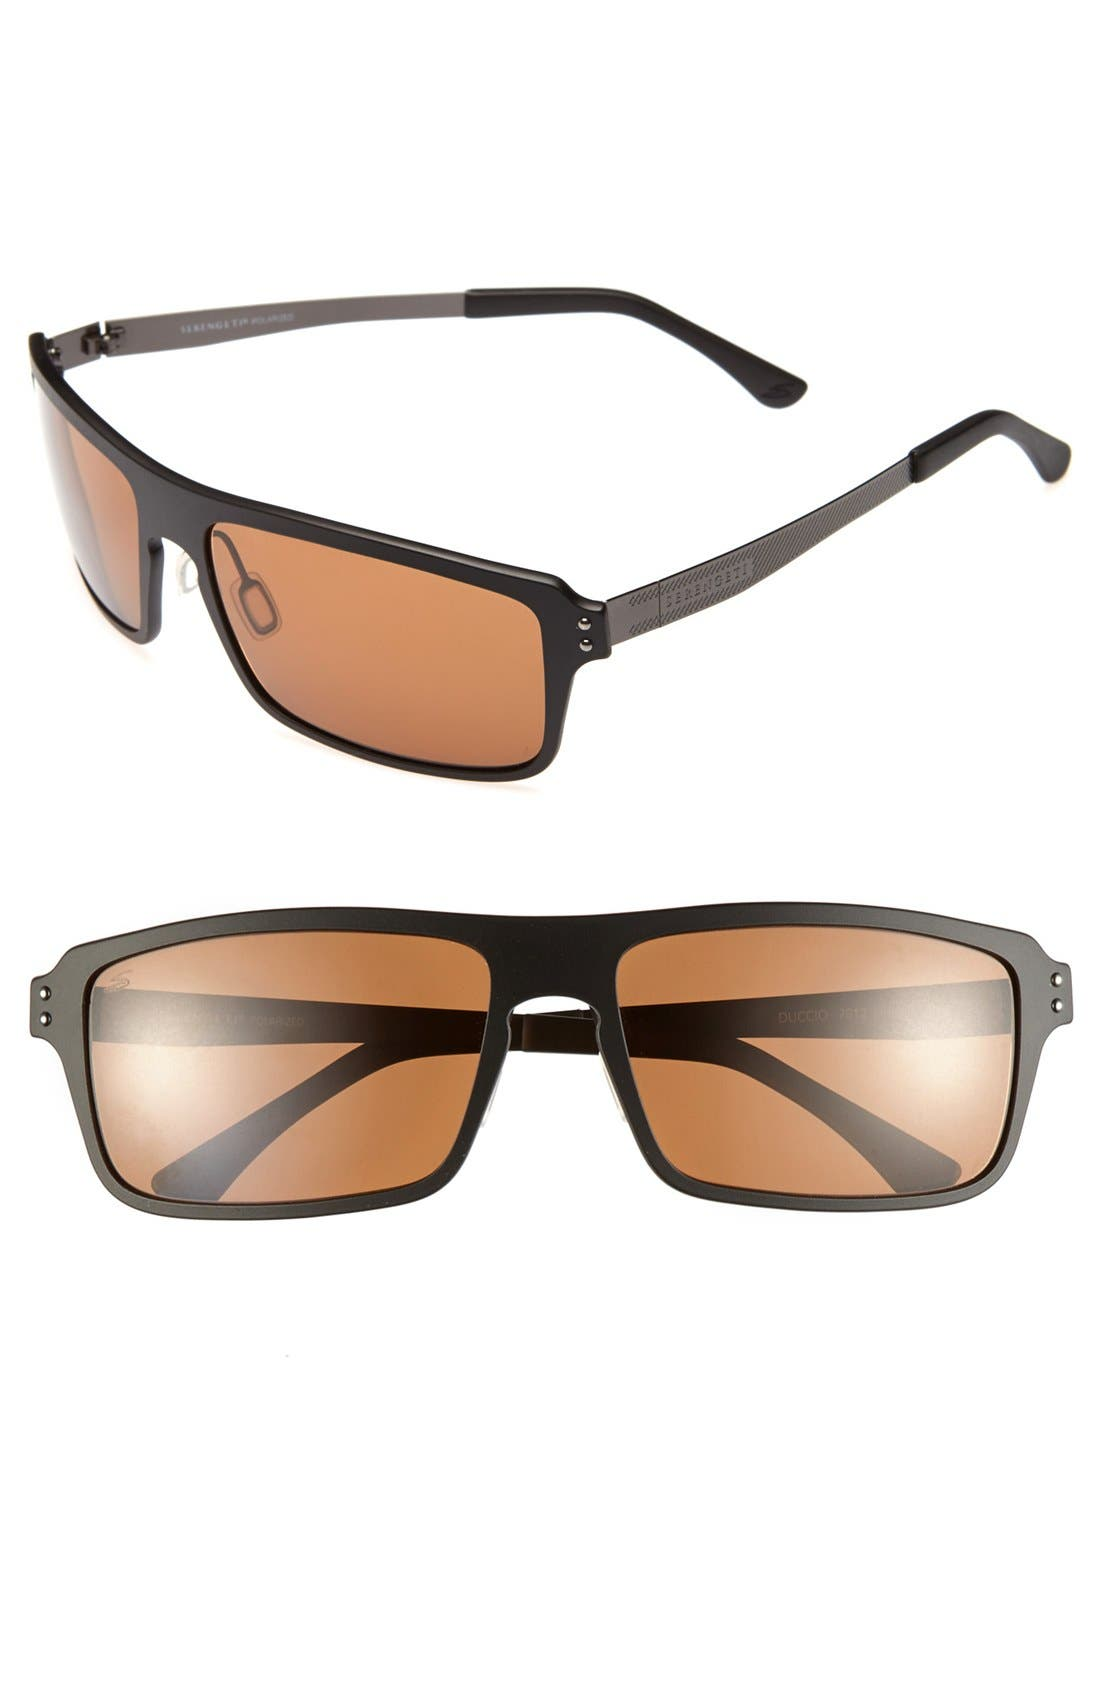 Main Image - Serengeti 'Duccio' 65mm Polarized Sunglasses